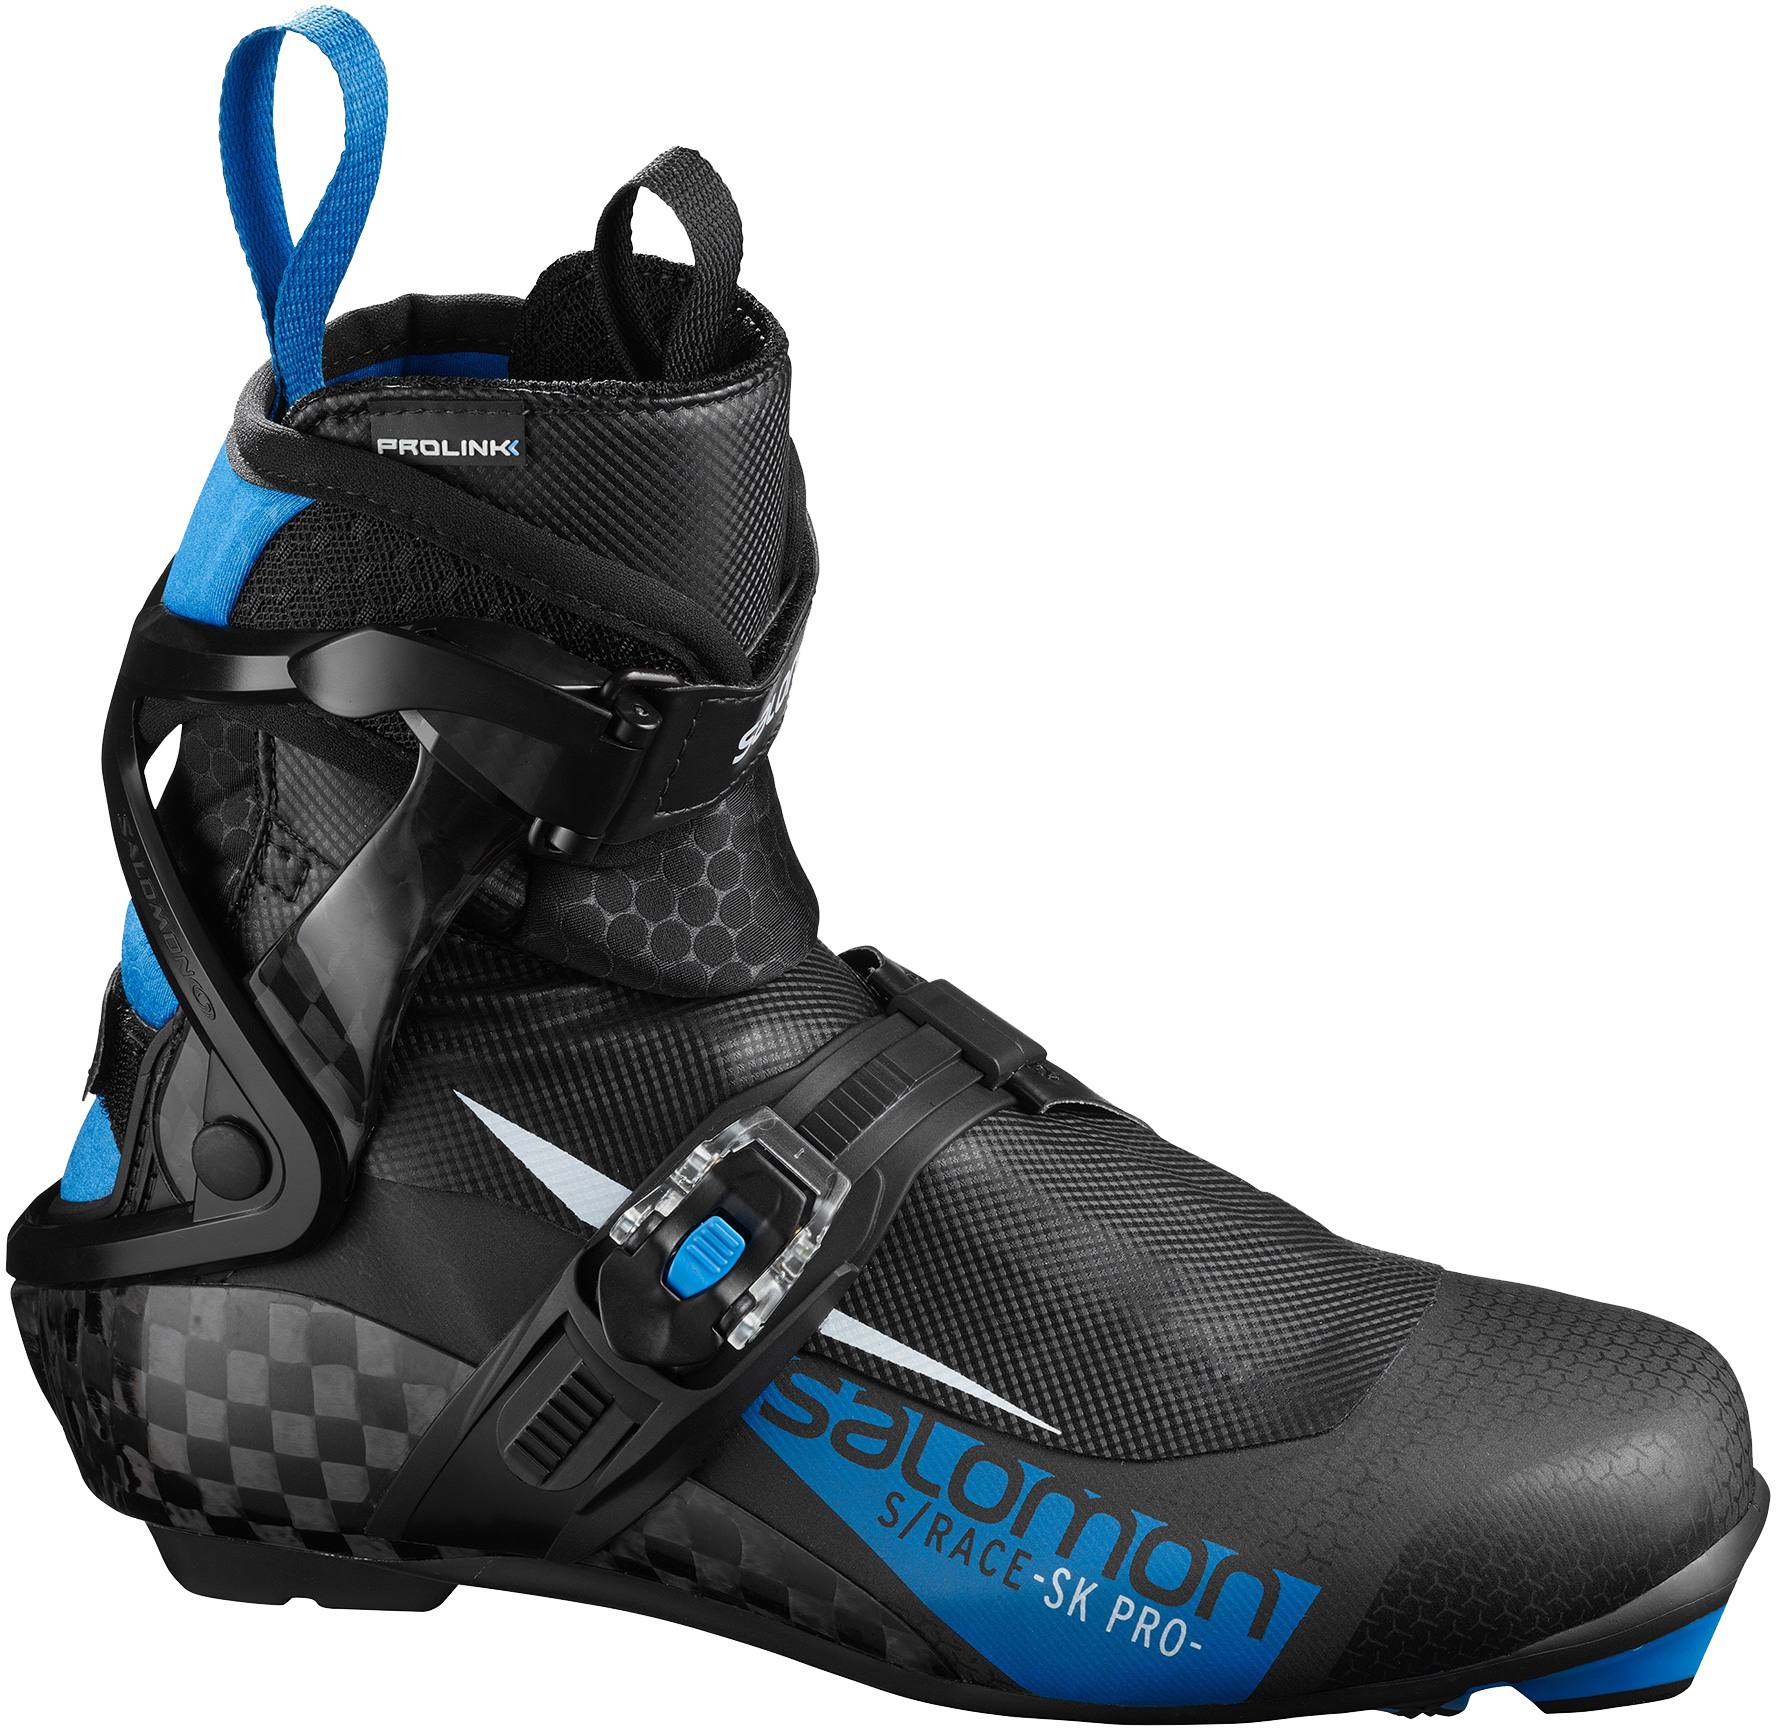 Salomon S/Race Skate Pro Prolink 19/20 Musta / Sininen UK 5,5